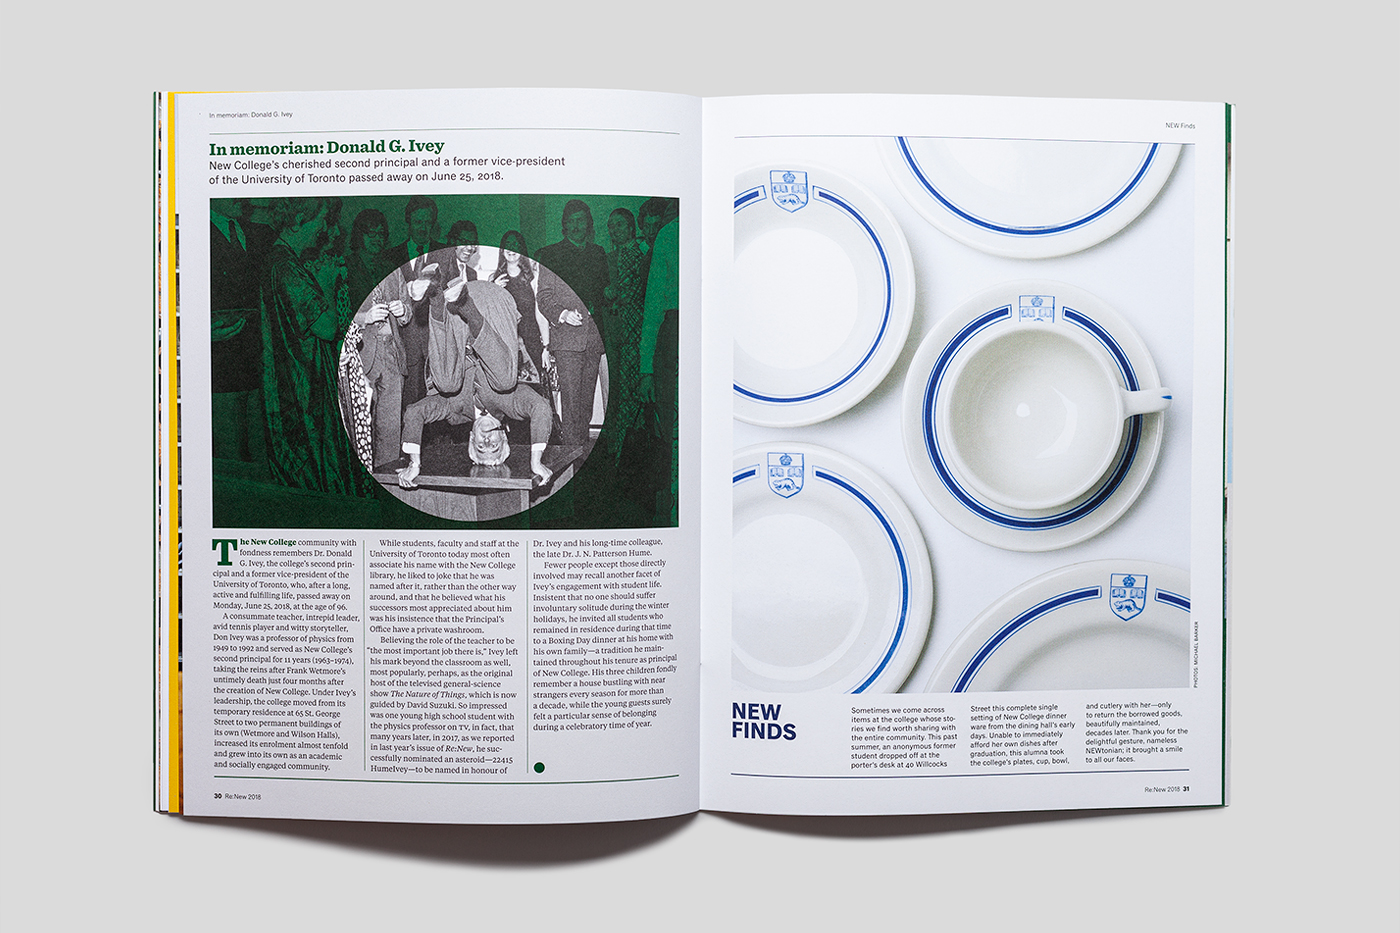 Re:New magazine spread